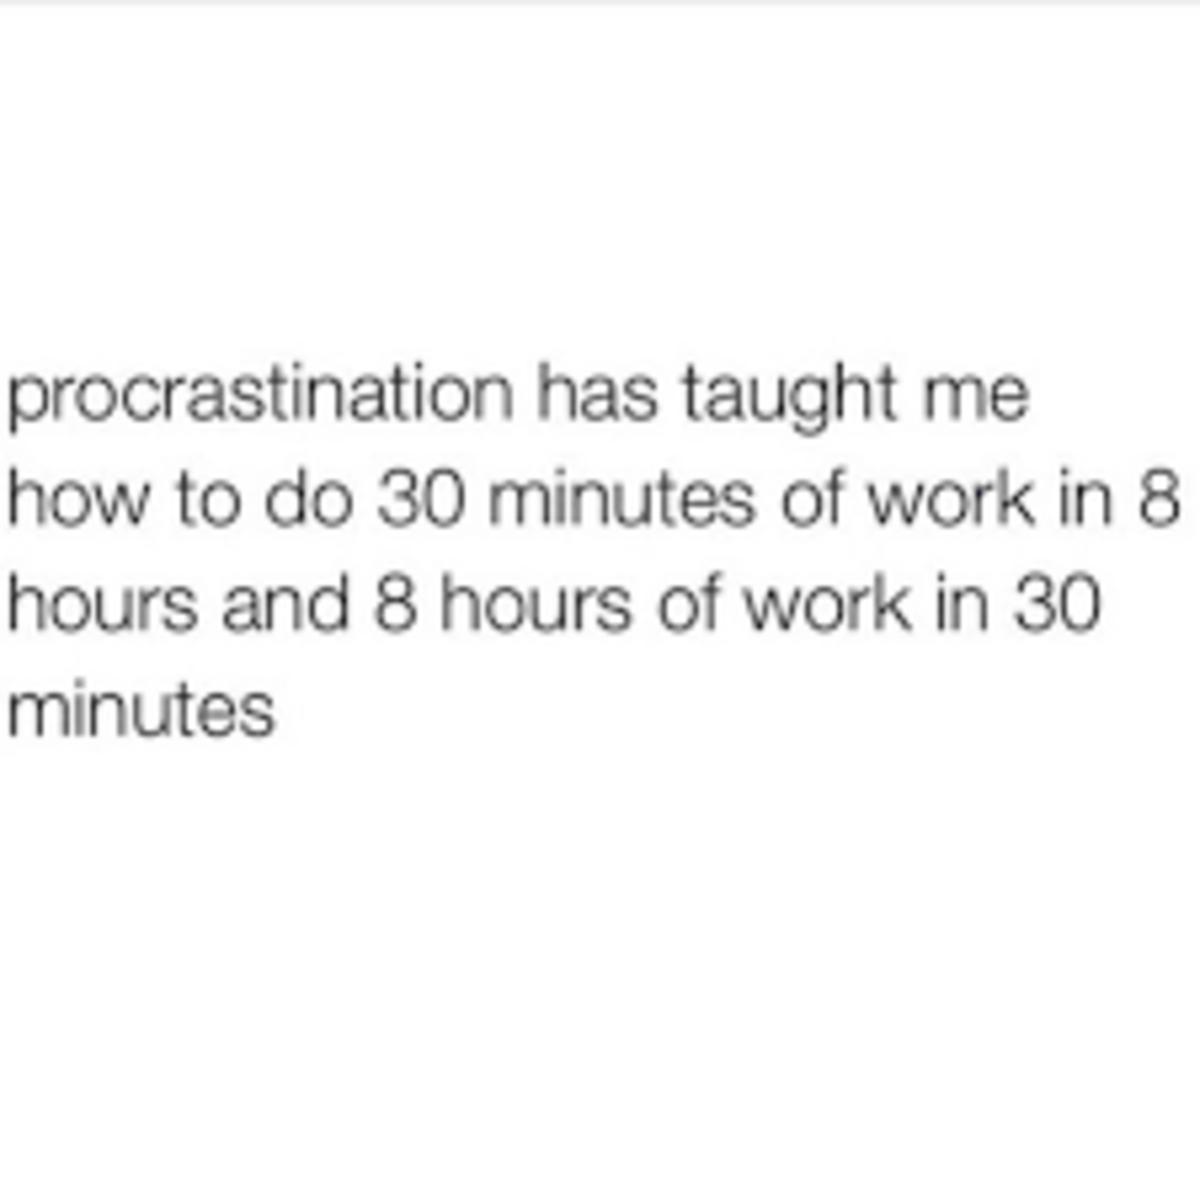 the-procrastination-in-everyday-life